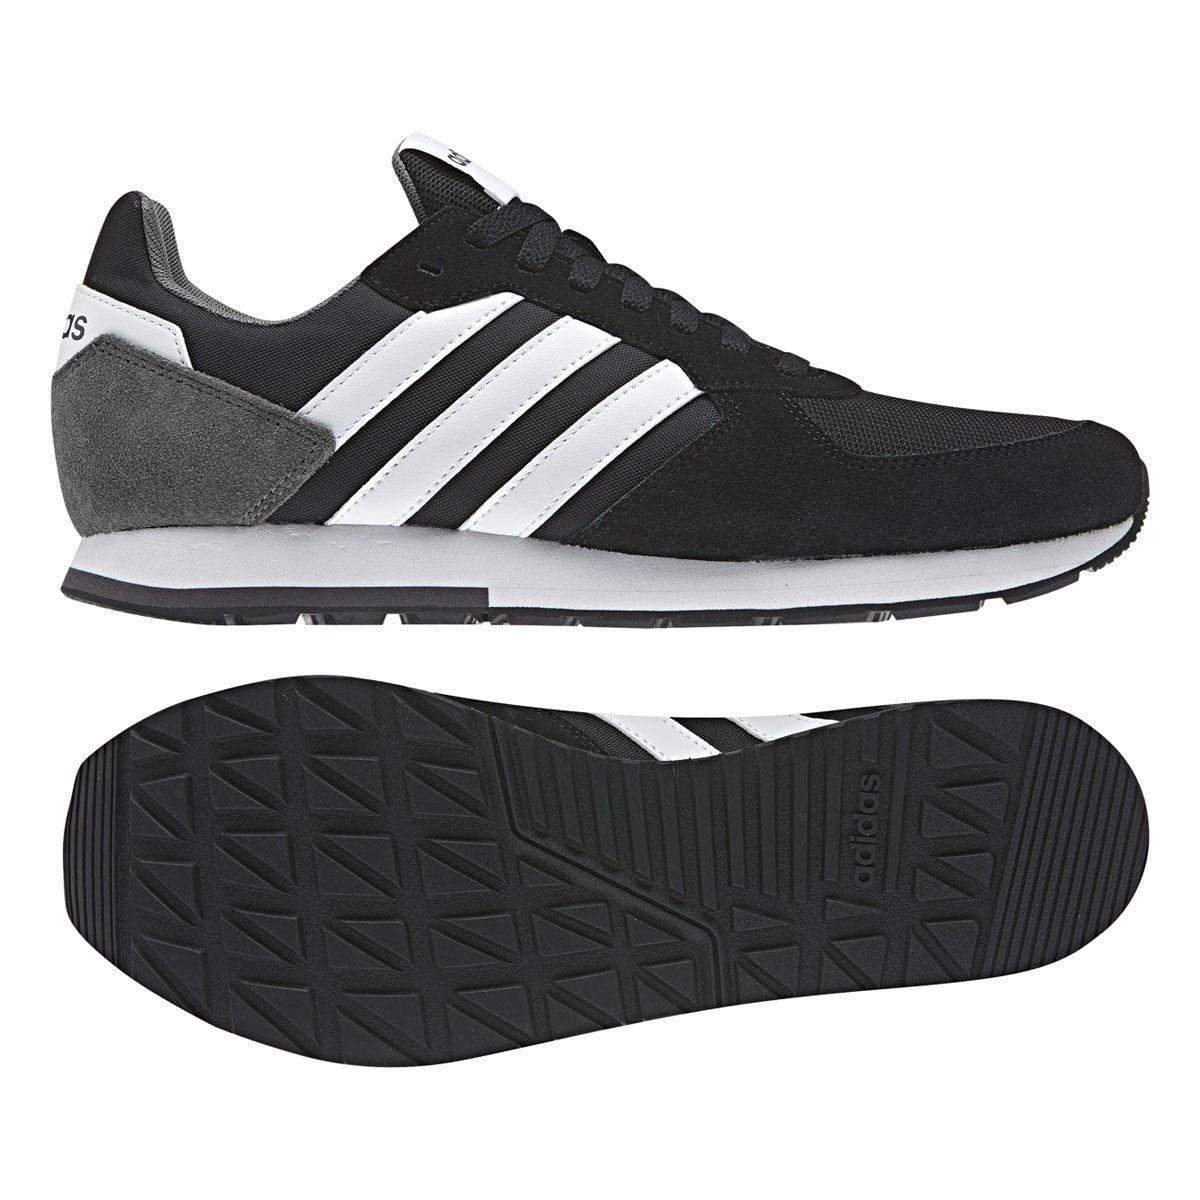 Tenis Running 8K Adidas - Caballero